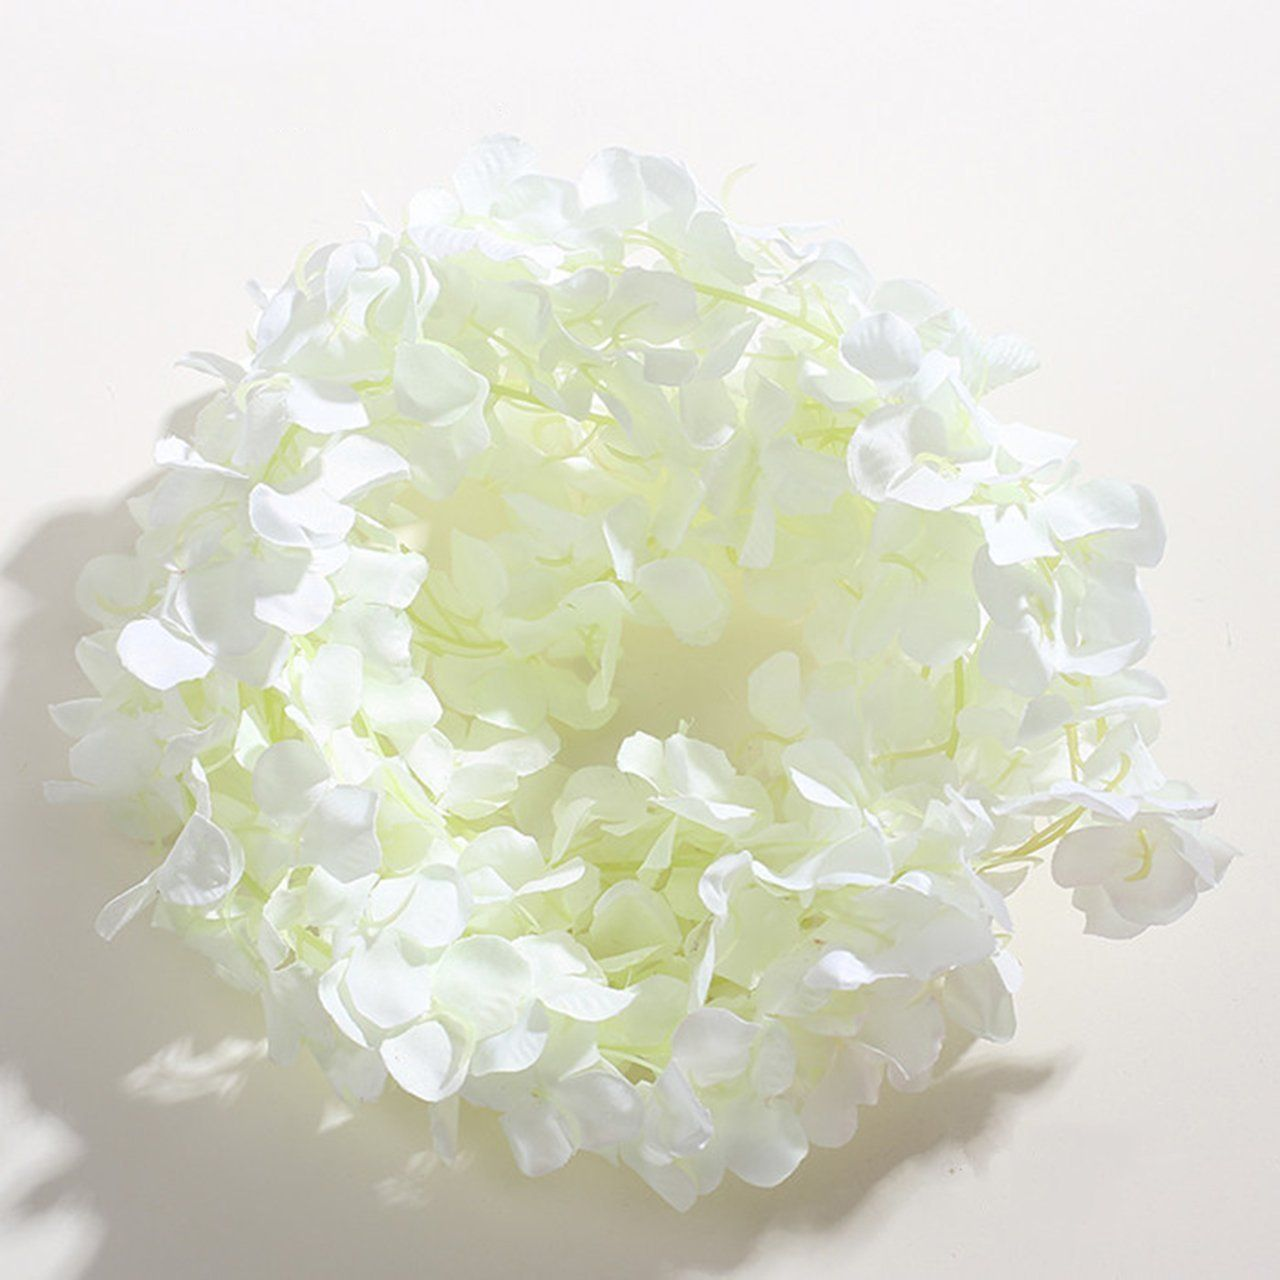 Uther 6.56 Ft 6 Strands Artificial Flowers Fake Hanging Vine Floral ...